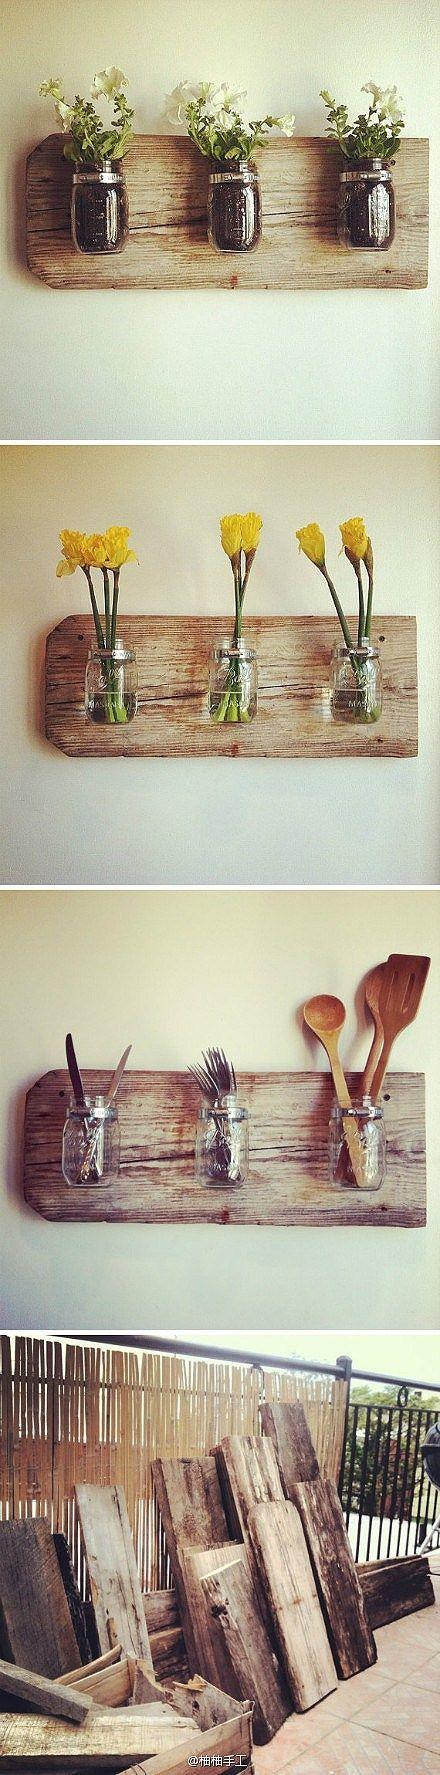 diy house decor   DIY Home Decor with Mason Jars and Reclaimed Wood